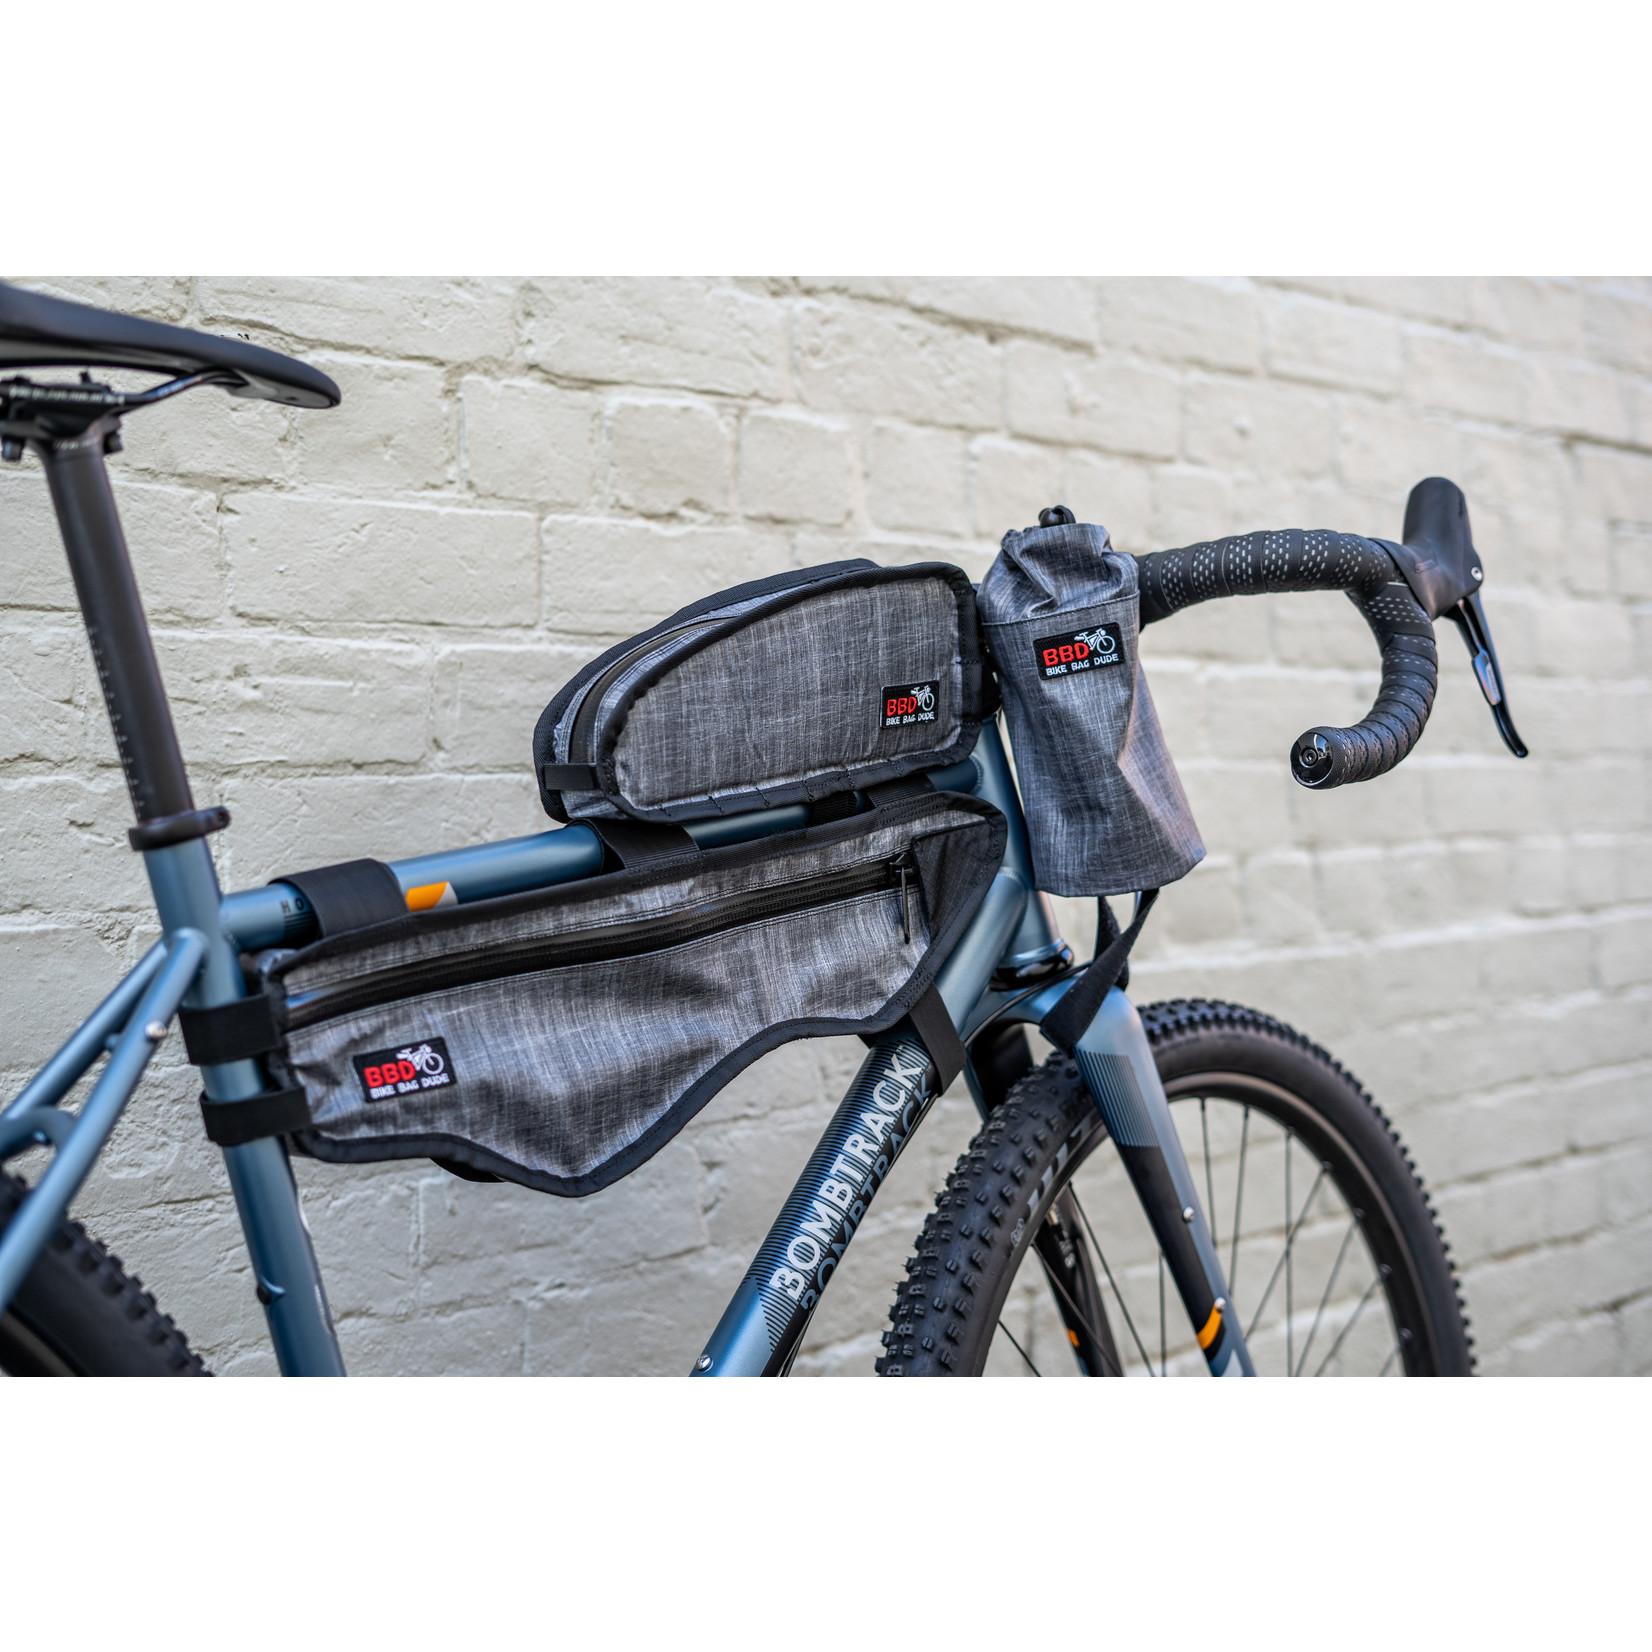 Bike Bag Dude Bike Bag Dude, TT Garage